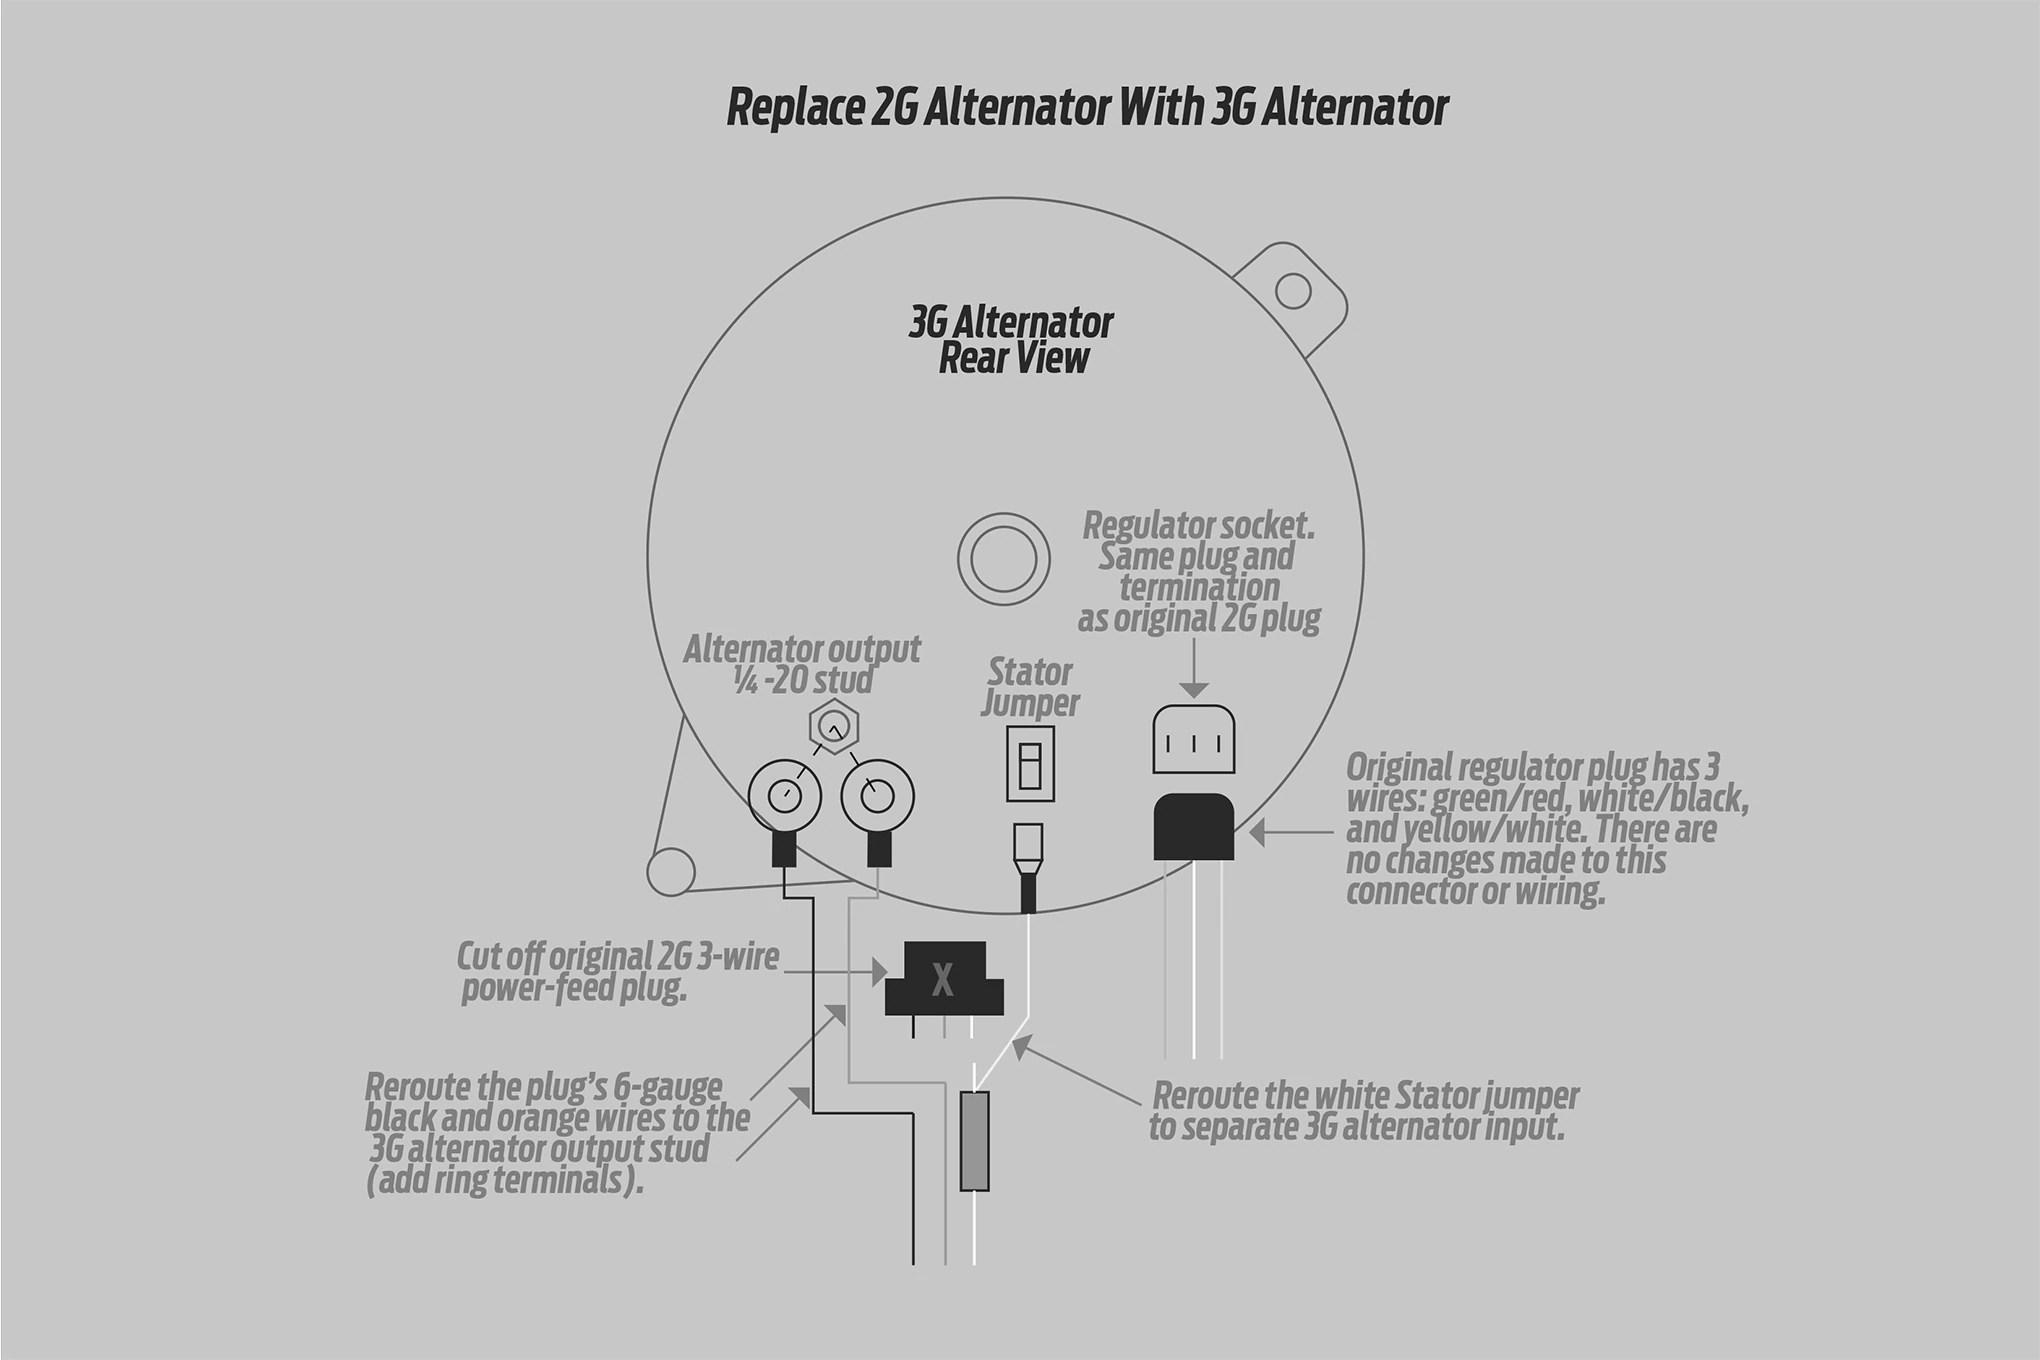 ron francis alternator wiring also ford 2g alternator wiring harness wiring diagram go [ 2040 x 1360 Pixel ]